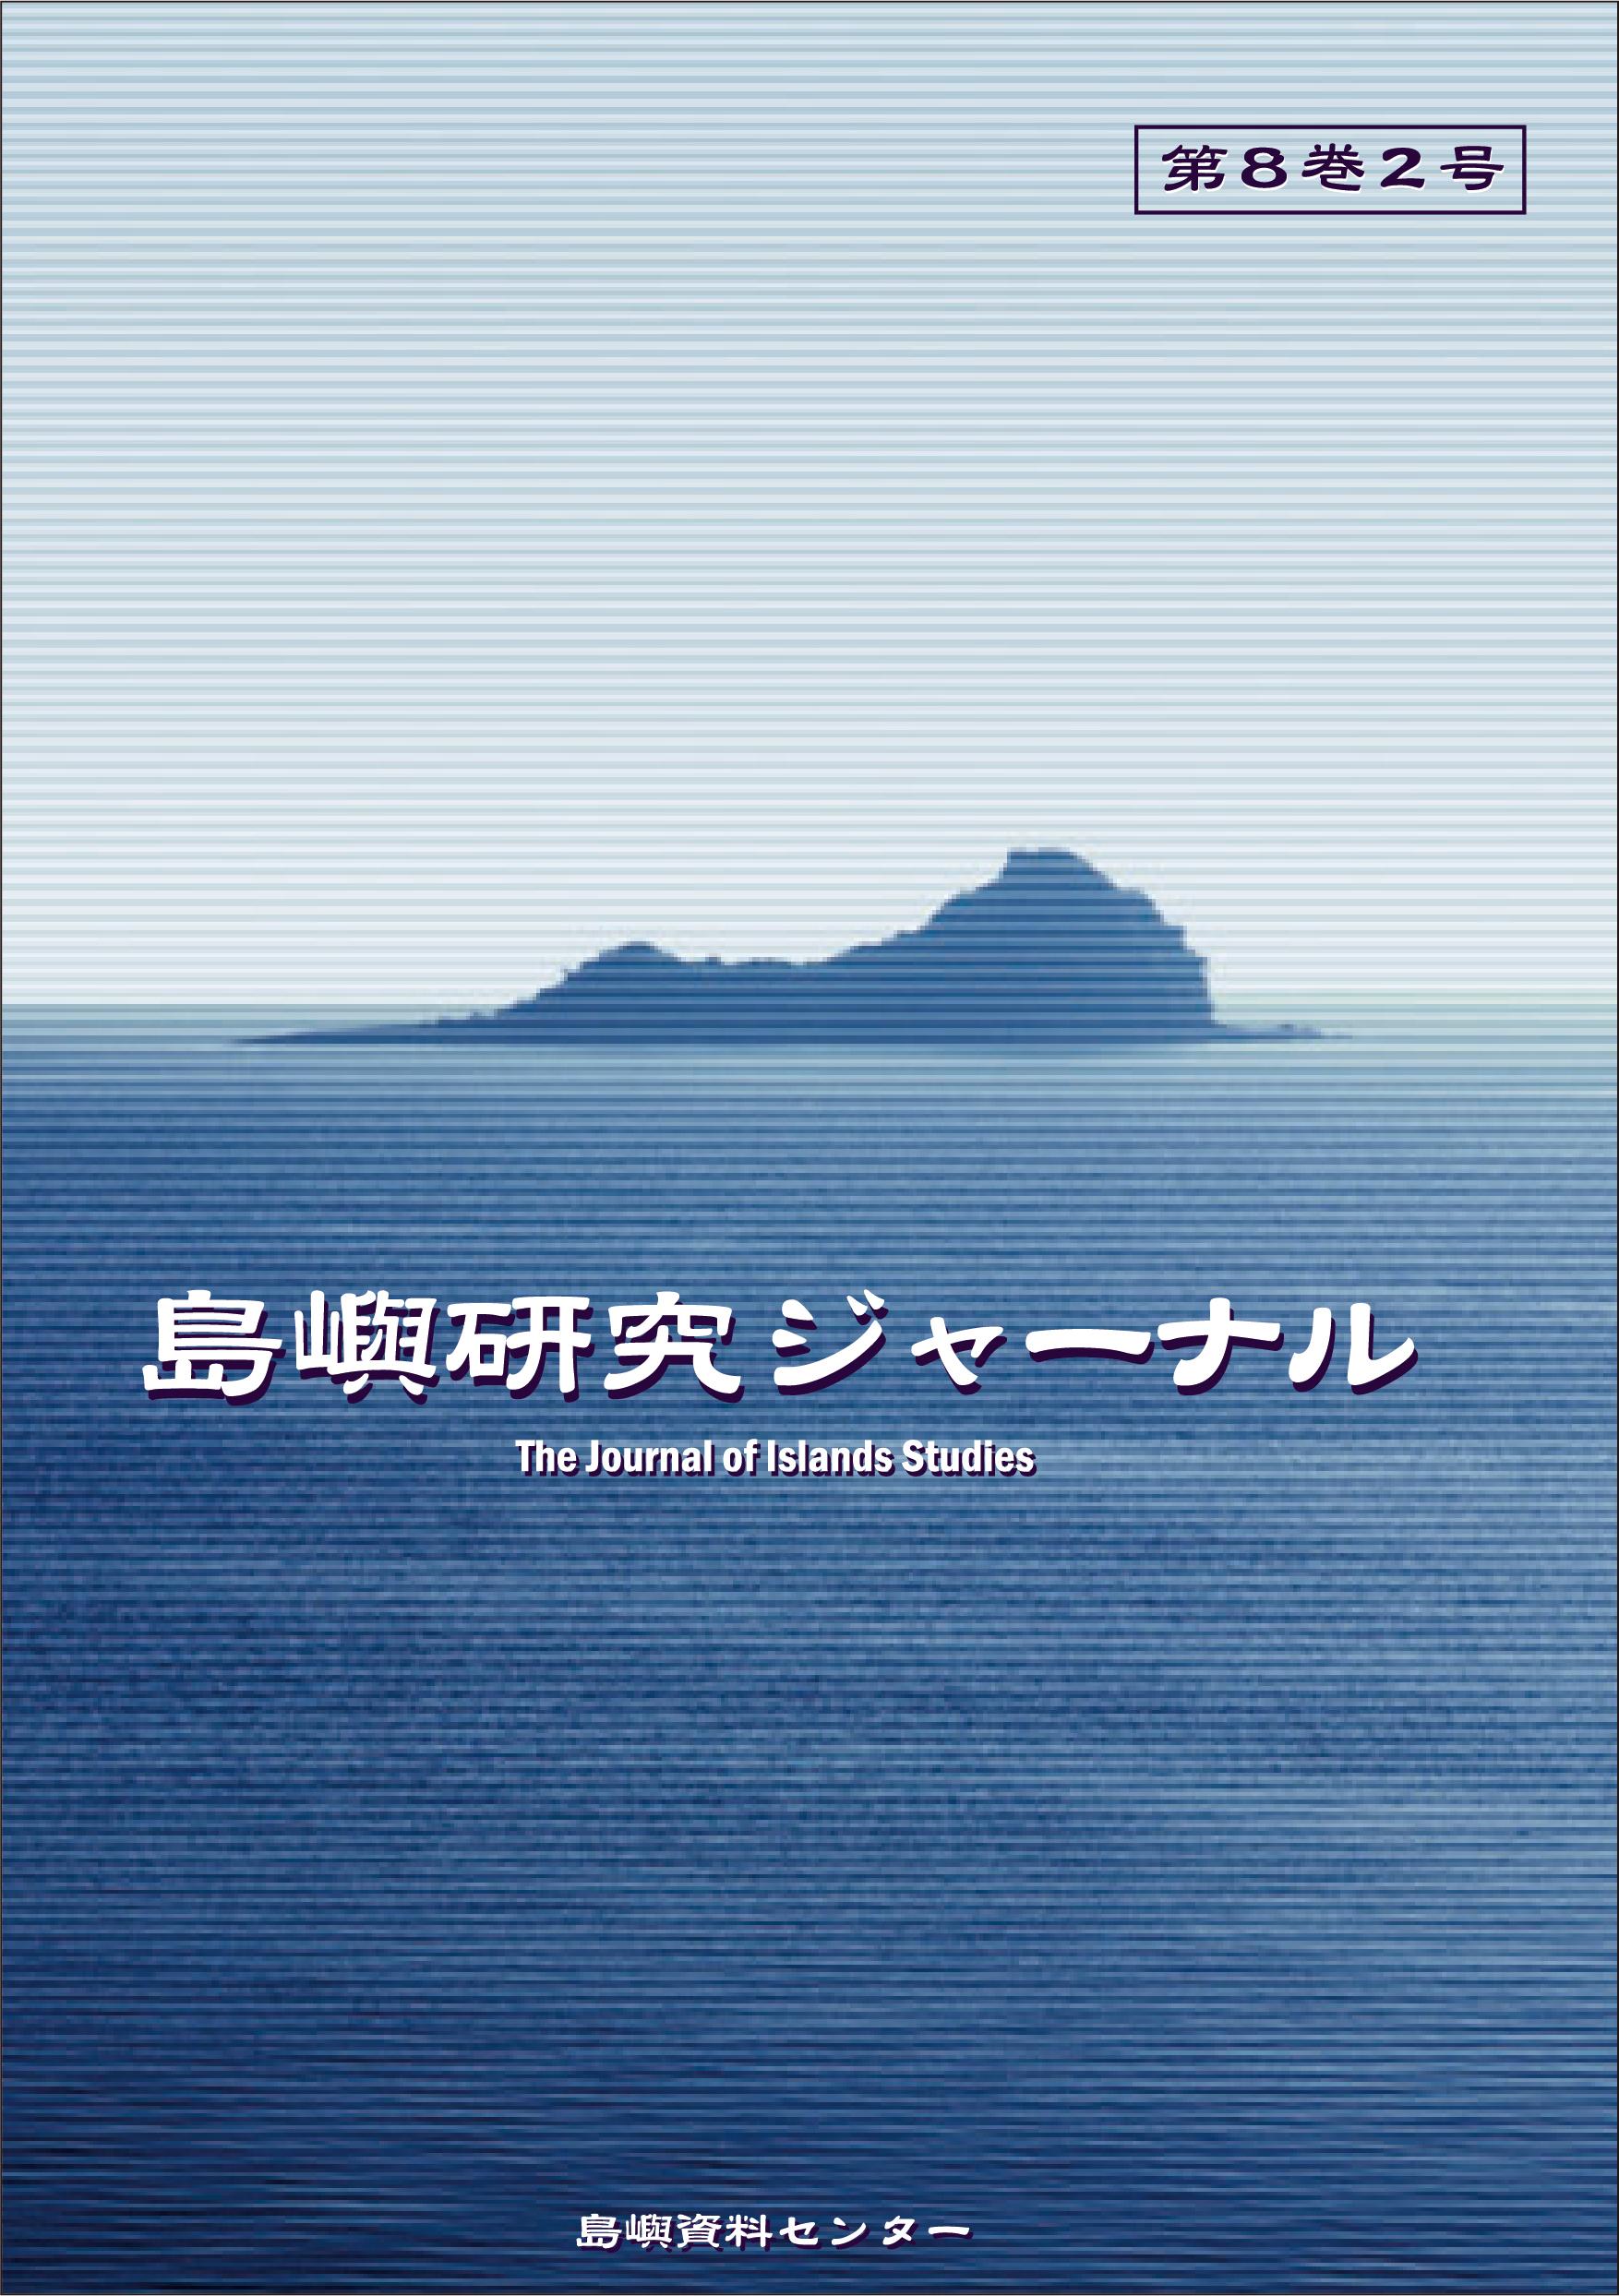 http://www.naigai-group.co.jp/books-img/9784909870049.jpg